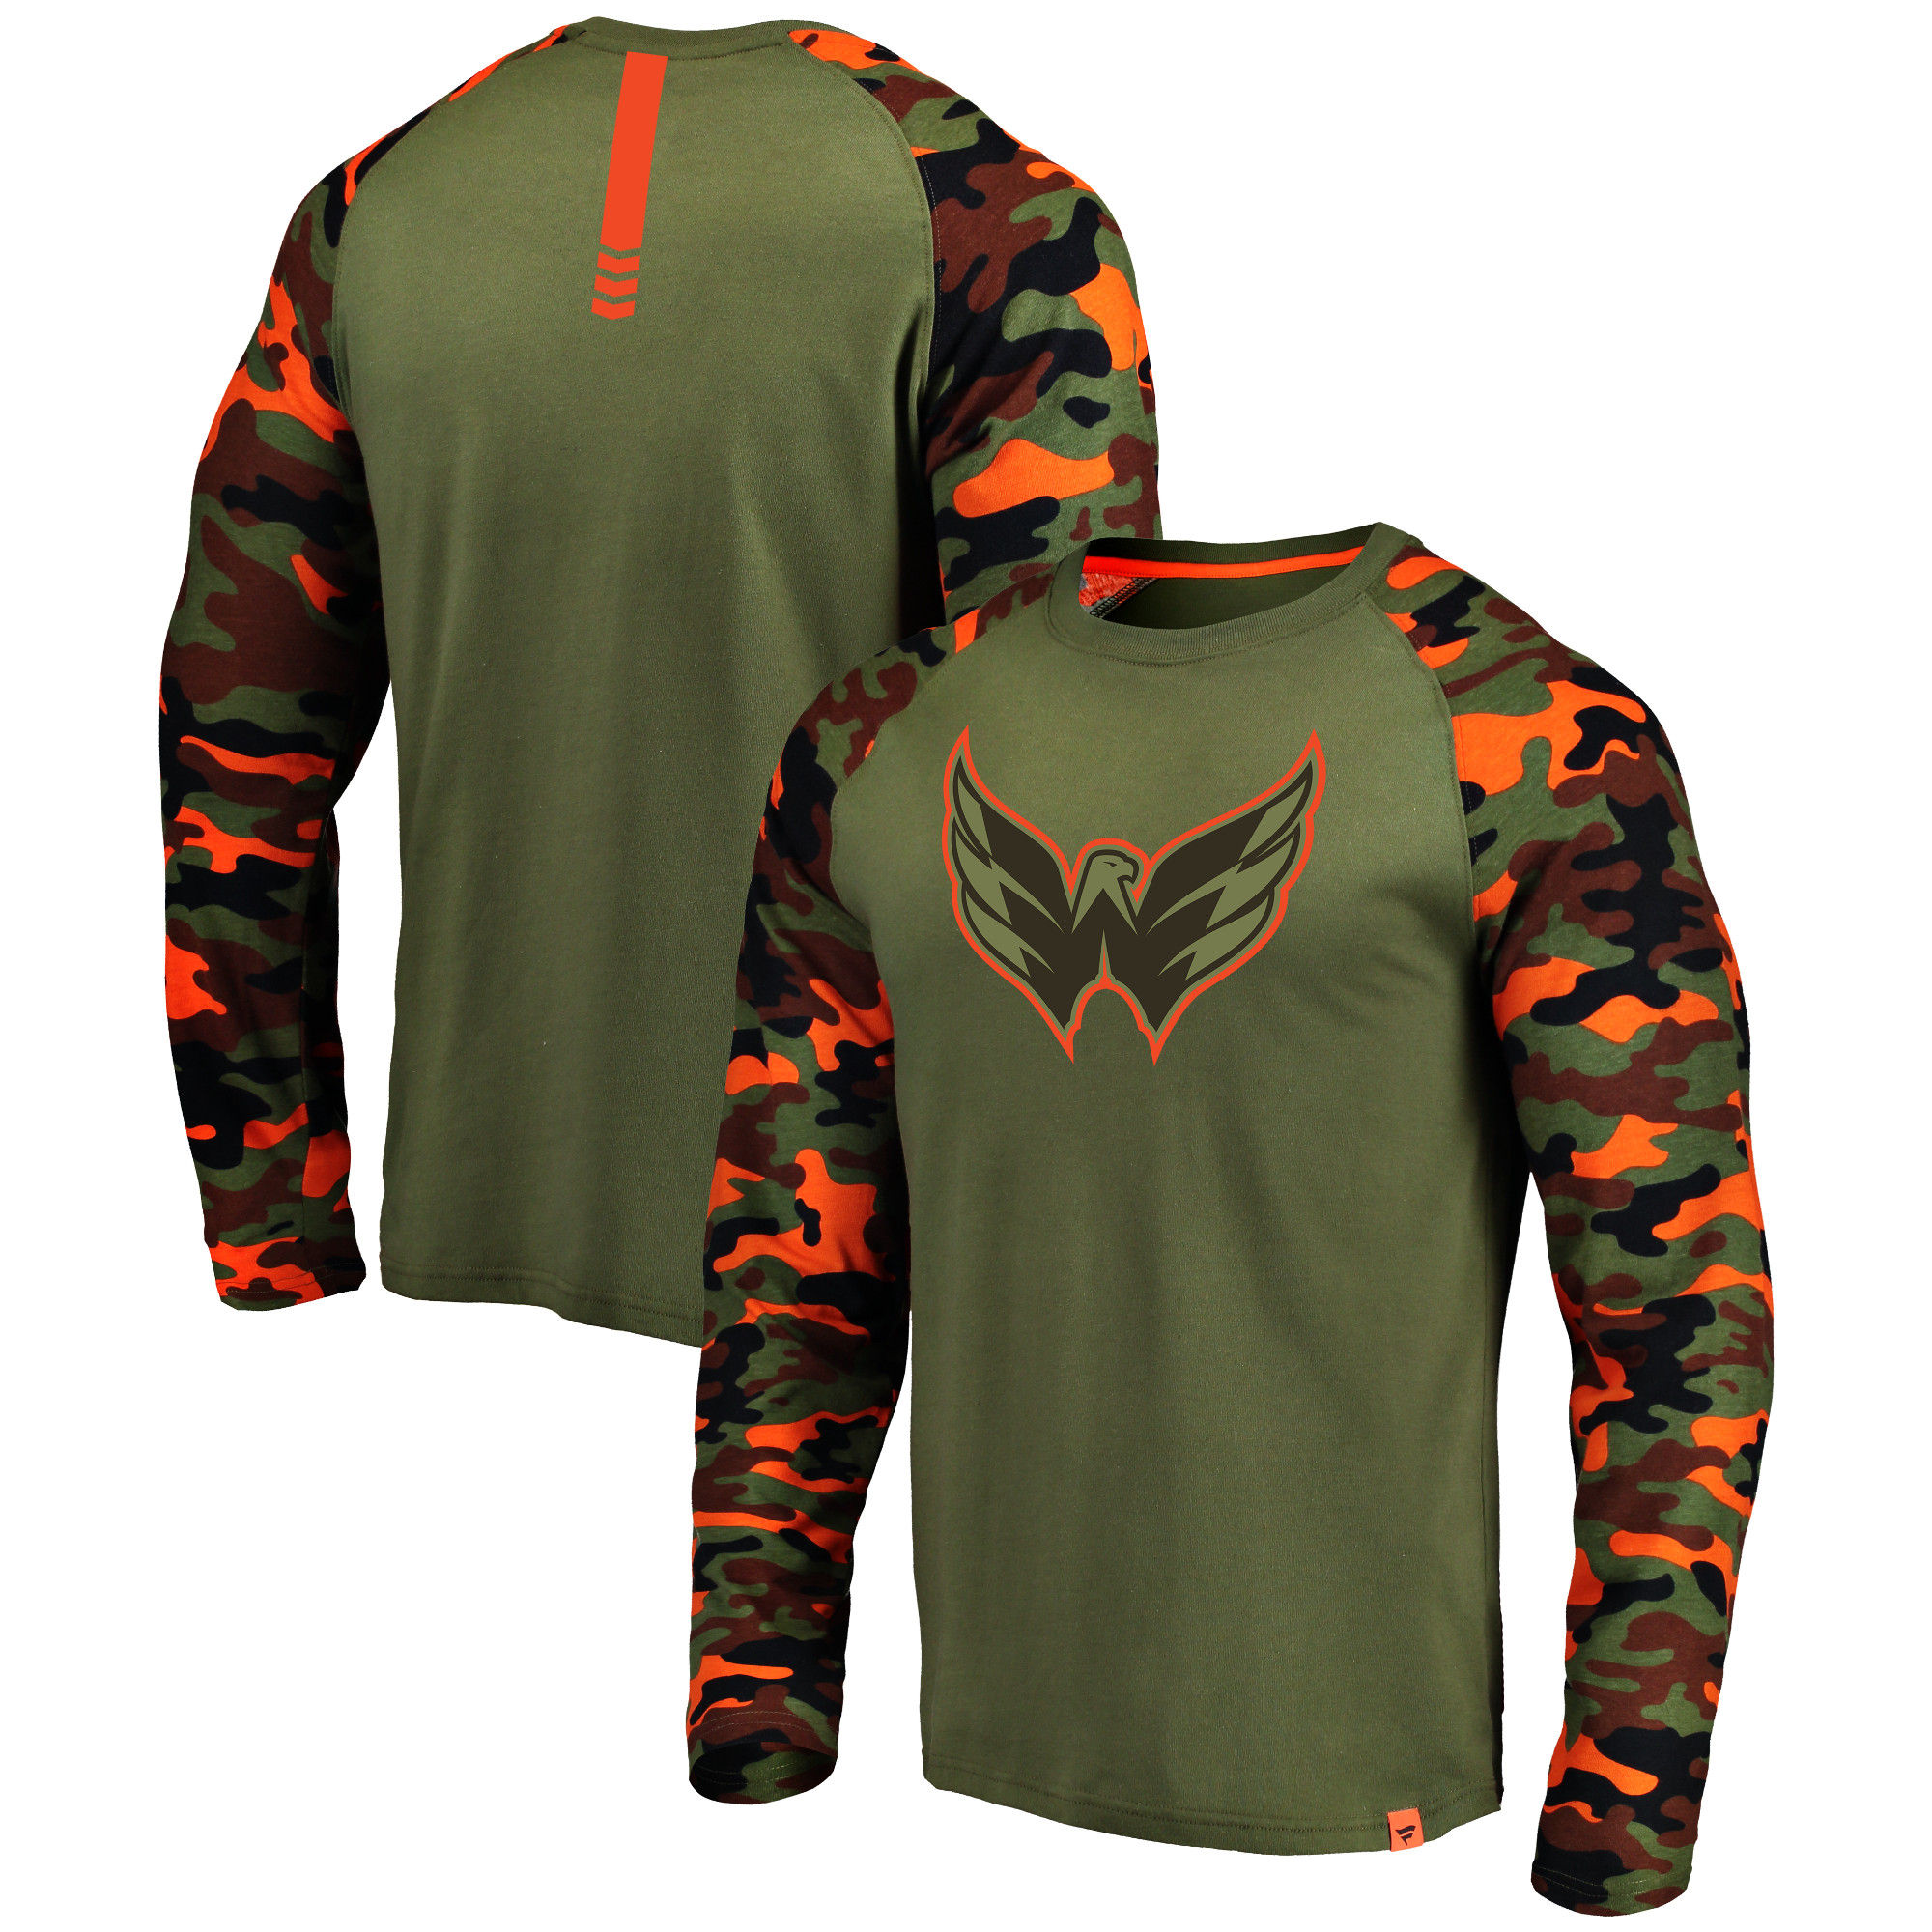 Washington Capitals Fanatics Branded Olive/Camo Recon Long Sleeve Raglan T-Shirt